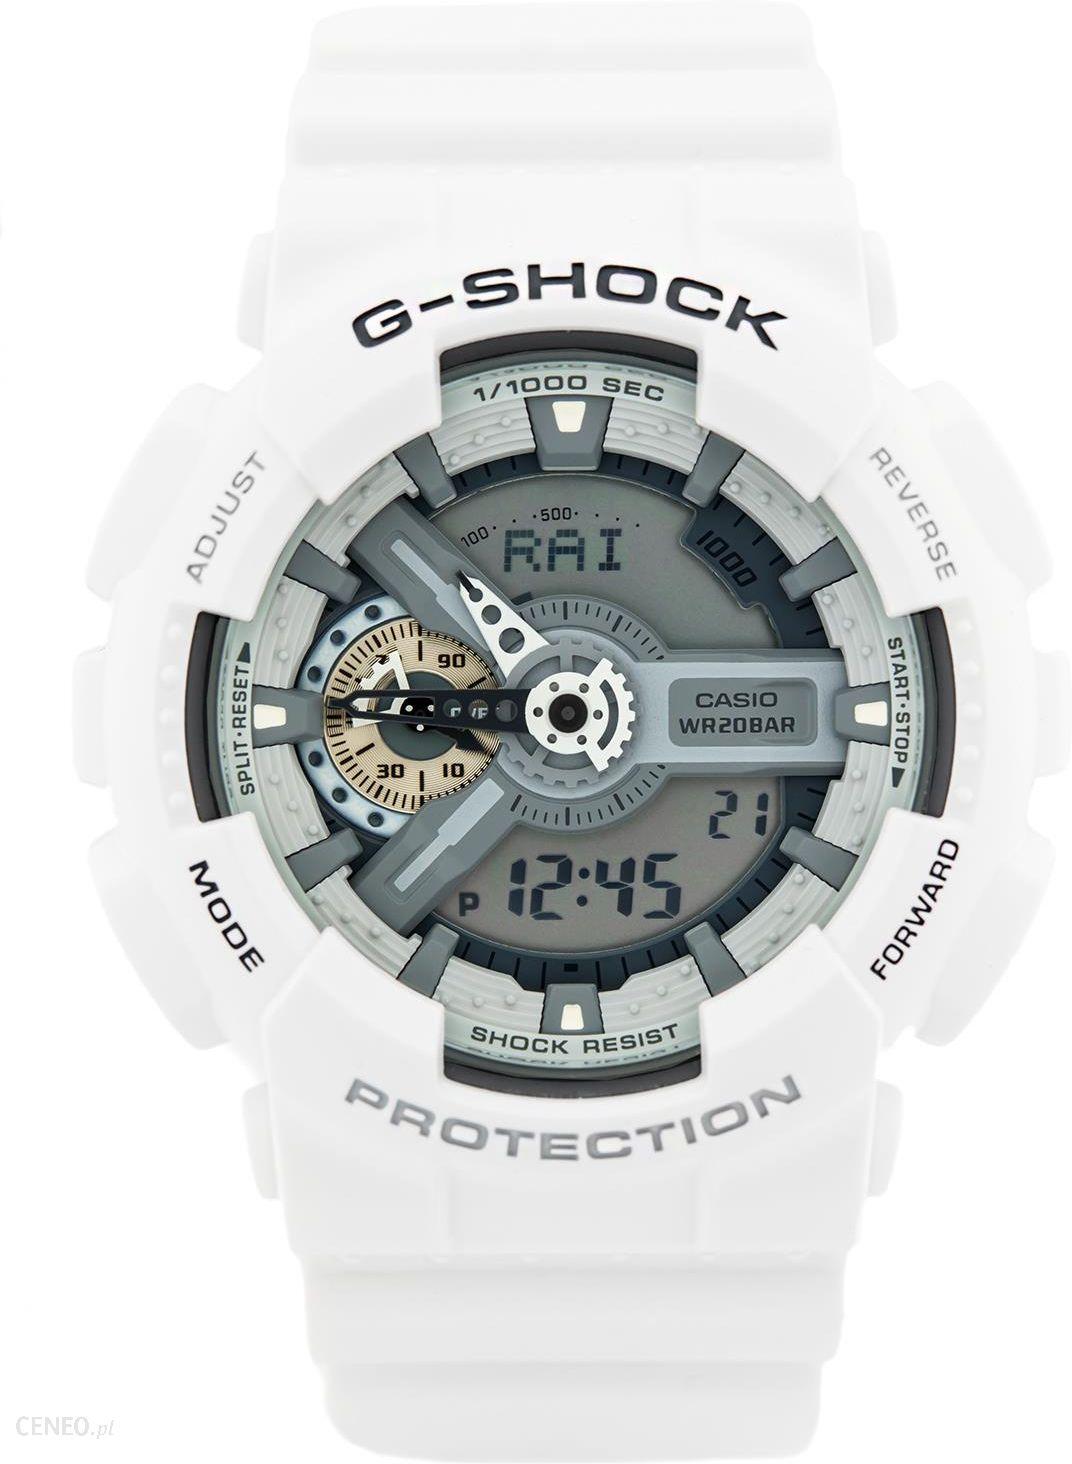 Zegarki Biae Mskie Casio G Shock Ga 110gw 7a Specials 110c 7aer